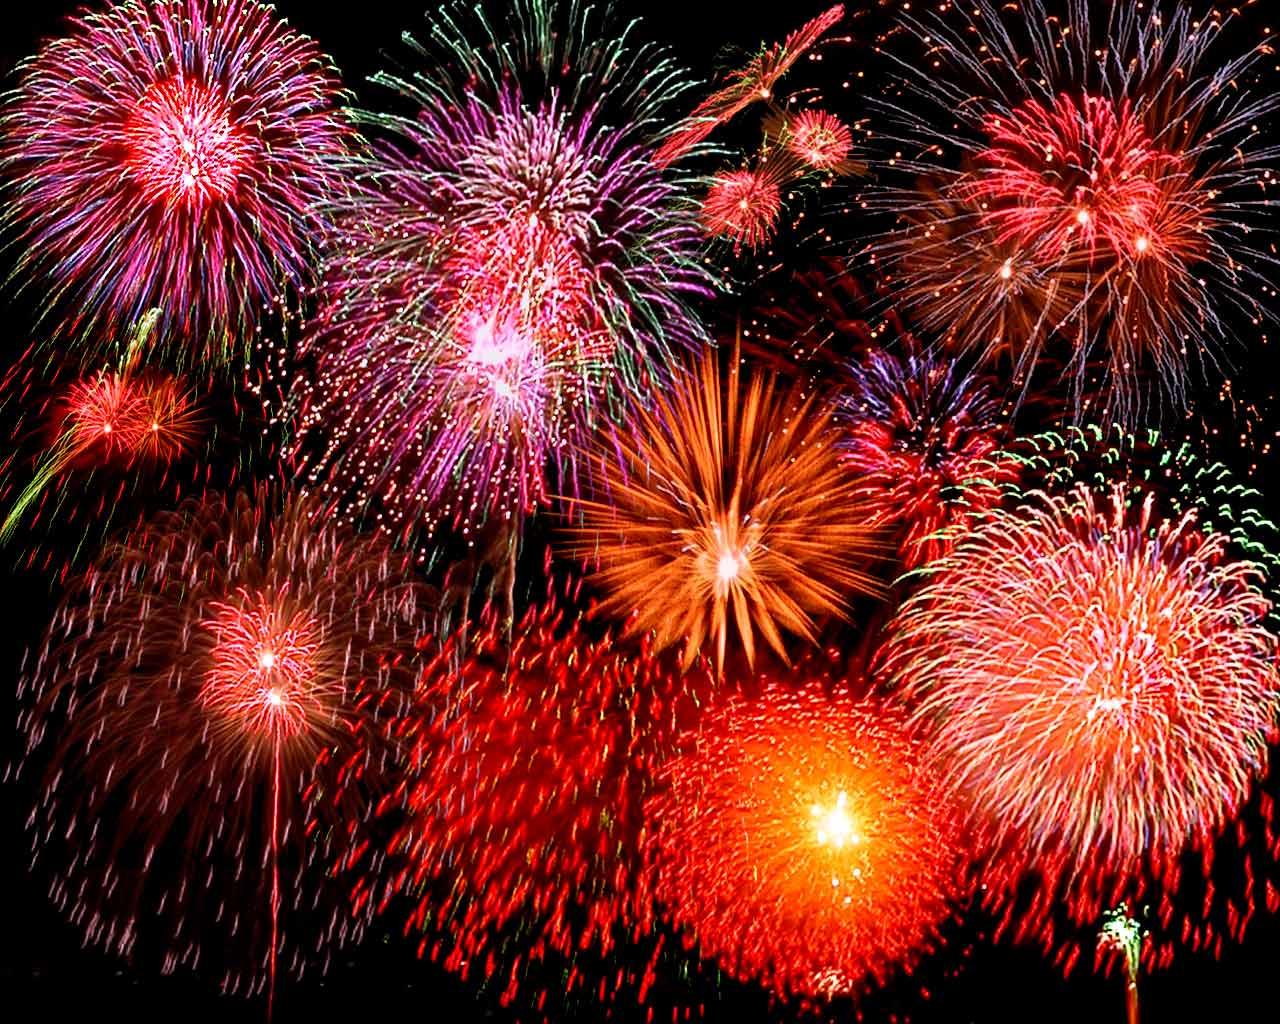 http://2.bp.blogspot.com/-MIHrMX4FVF0/UAhWW8QF_qI/AAAAAAAAAJk/JCHXJiof_64/s1600/fireworks.jpg